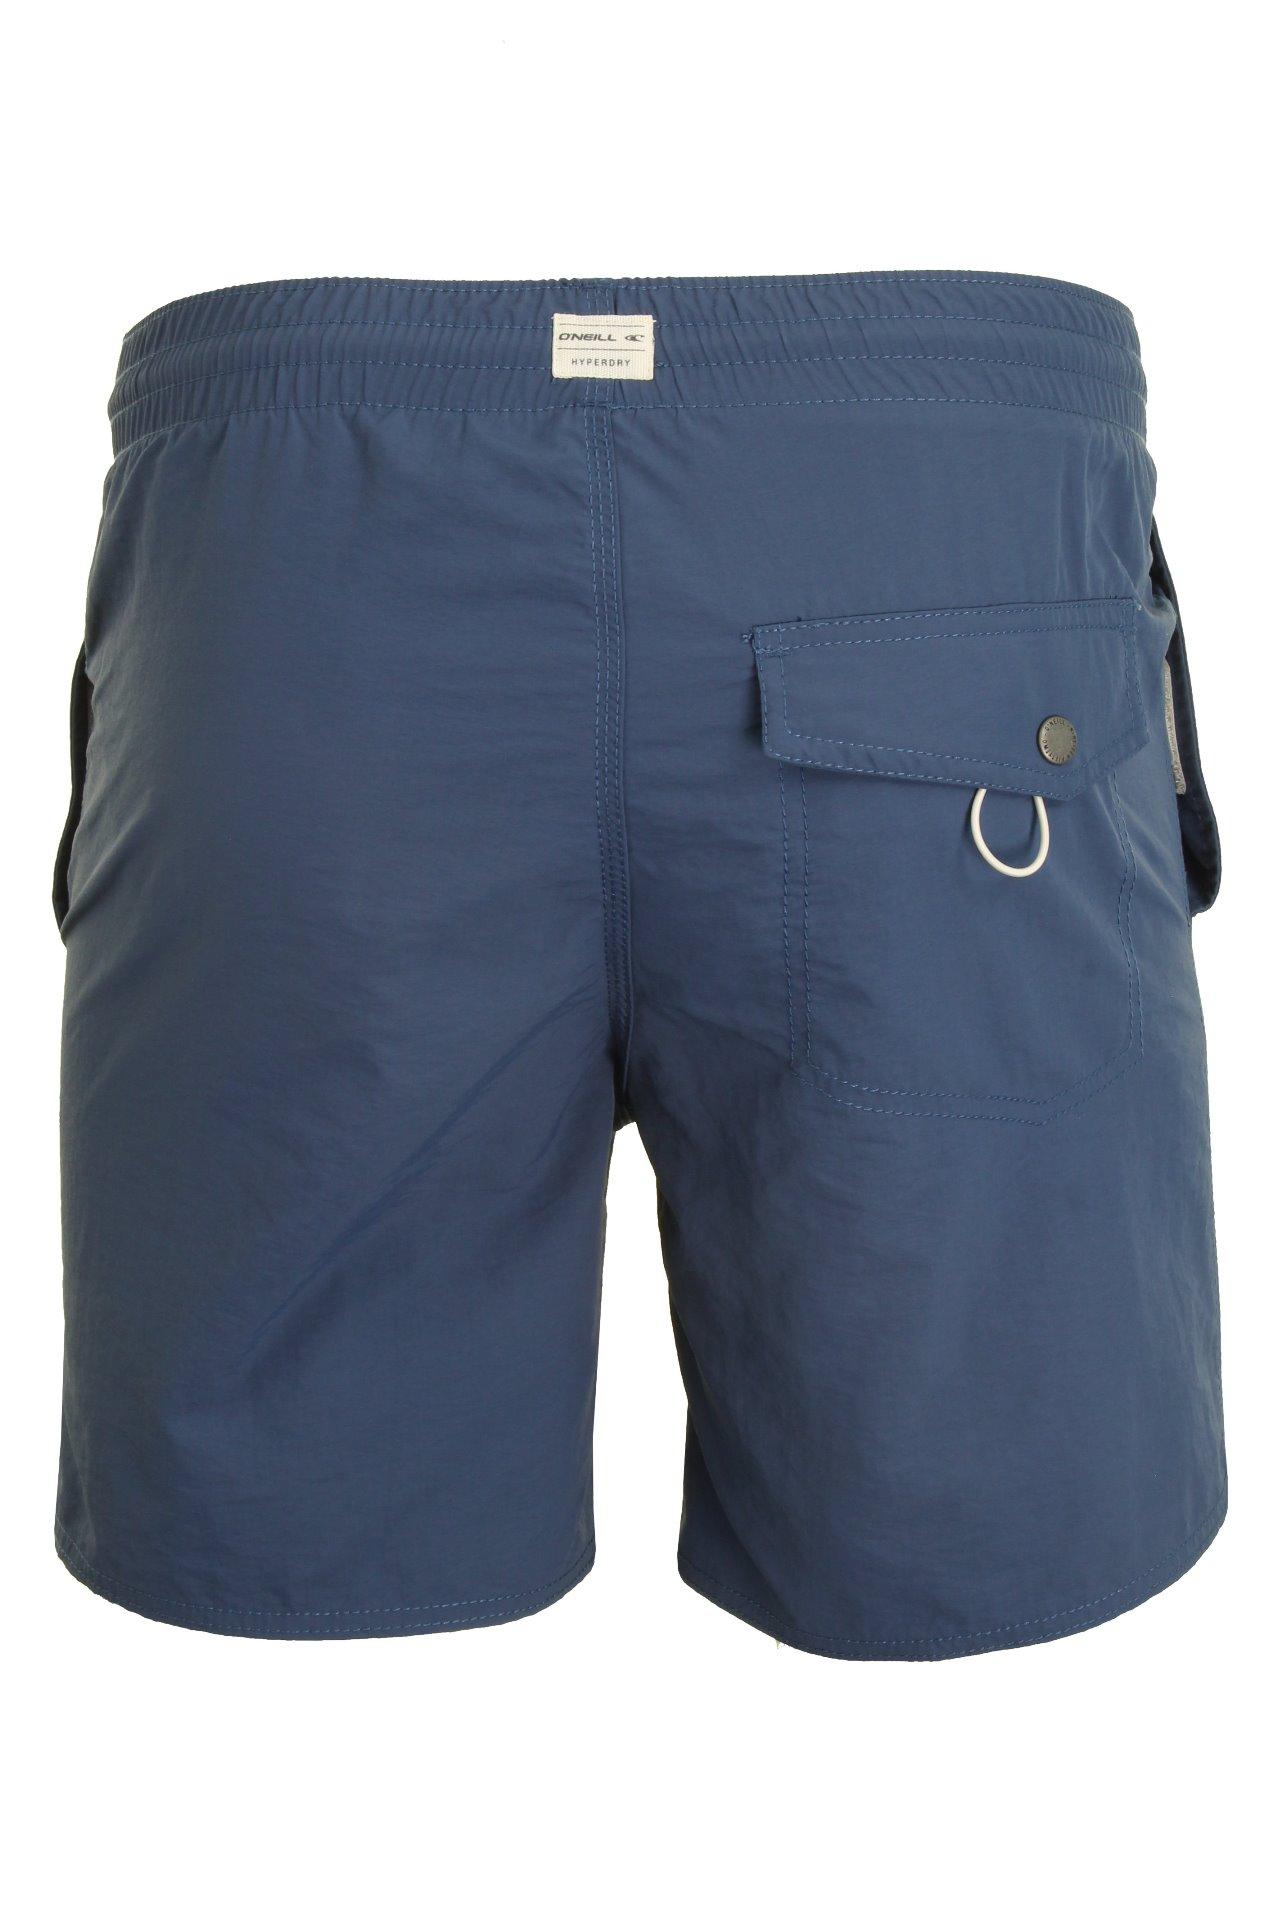 O-039-Neill-Mens-039-Vert-039-Swim-Board-Shorts thumbnail 11